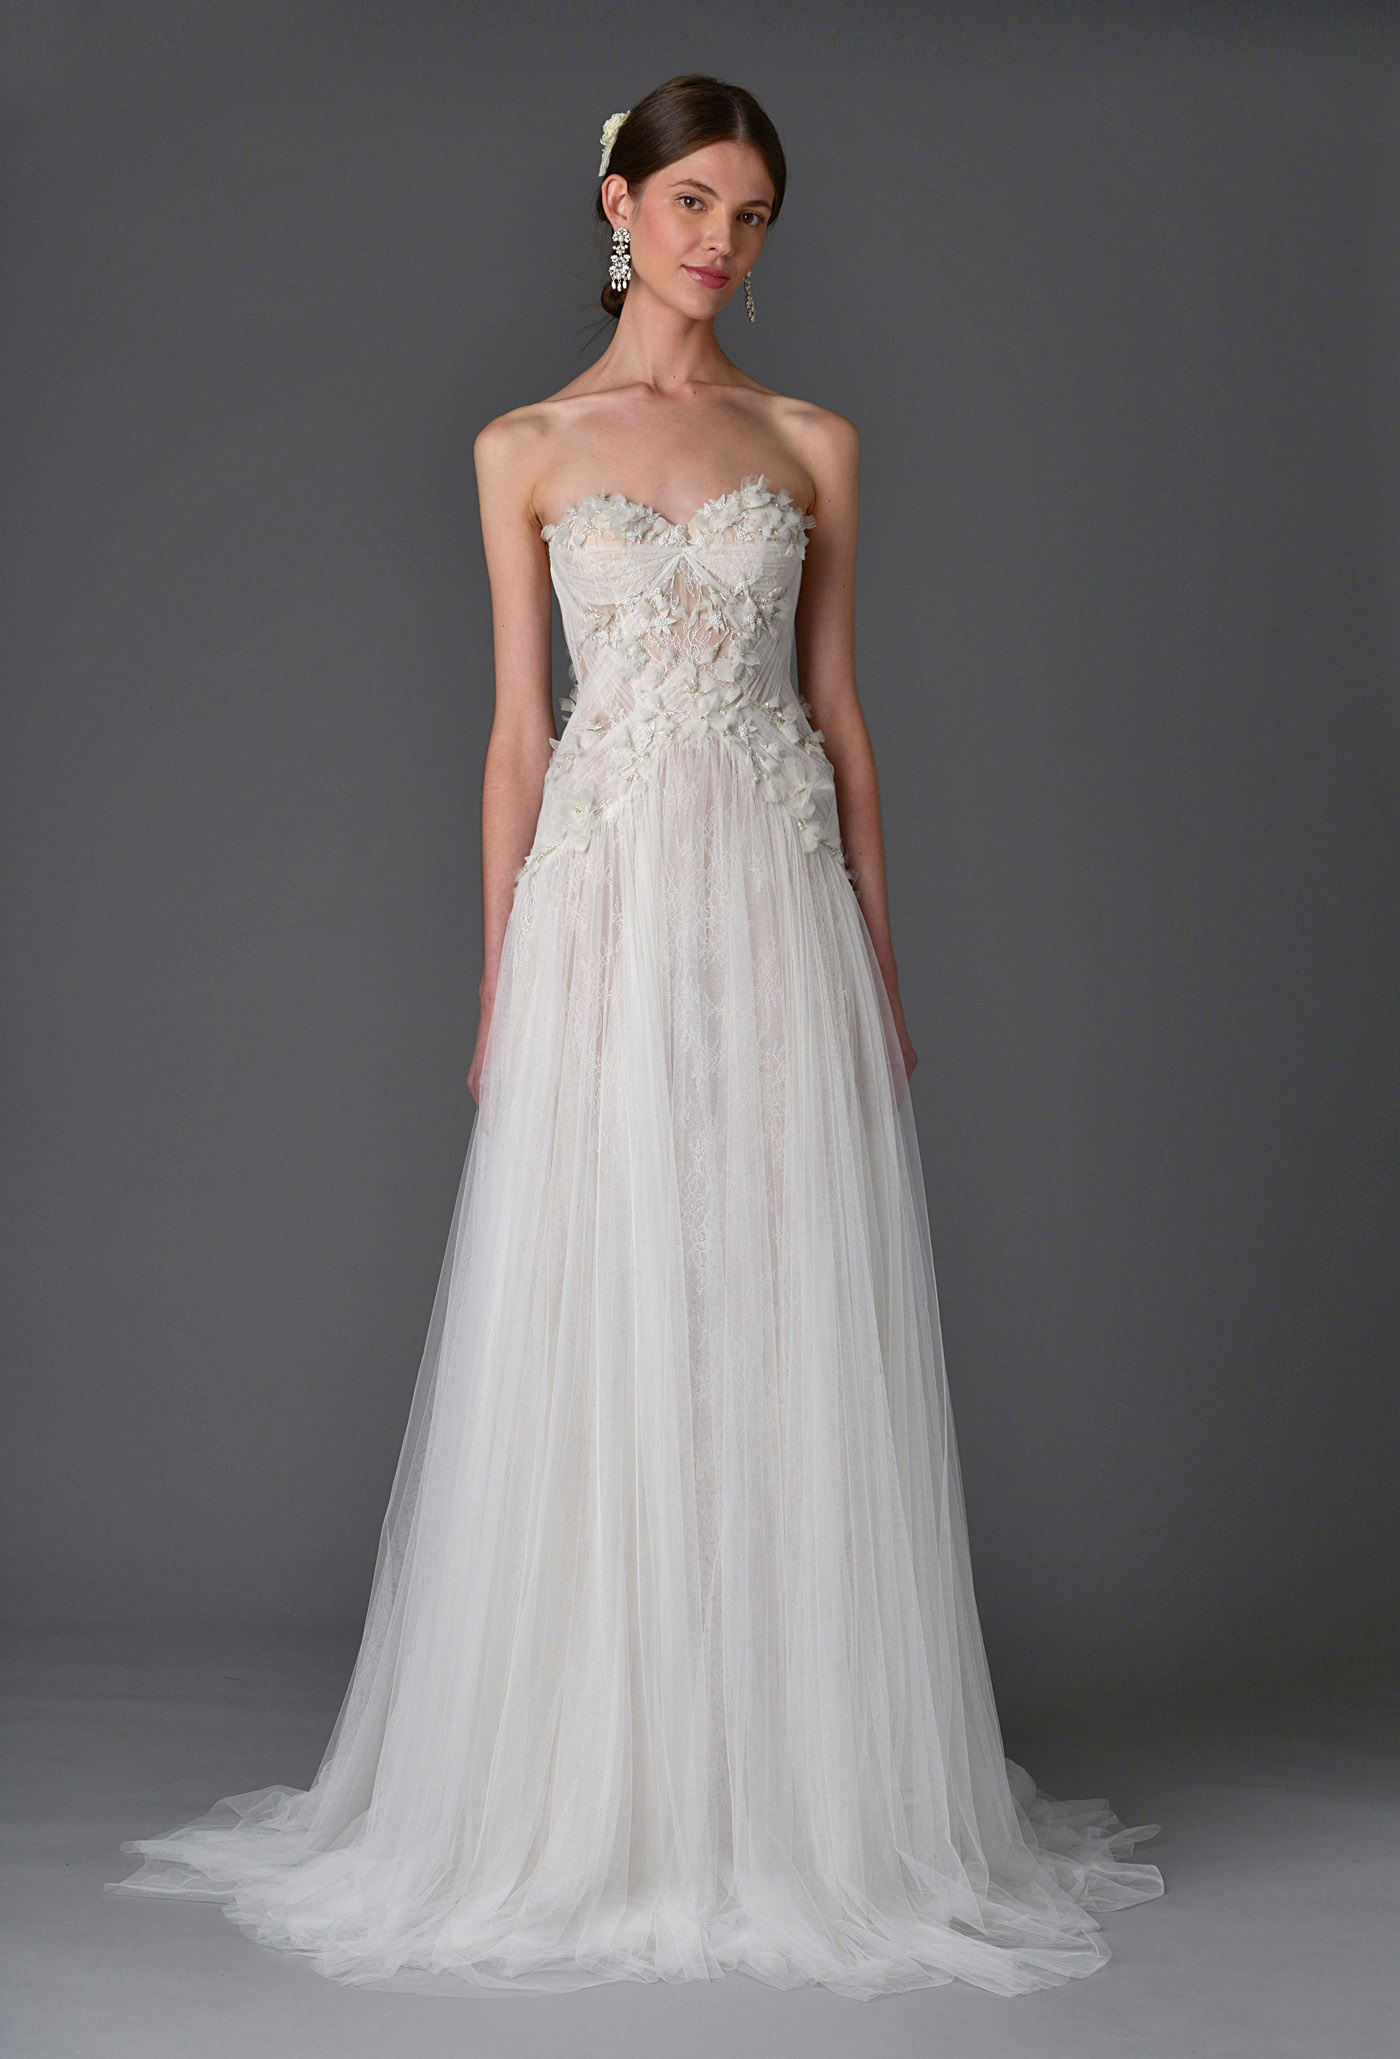 Marchesa Spring and Summer 2017 Bridal Collection 12 - Spring/Summer Wedding Dress Inspiration